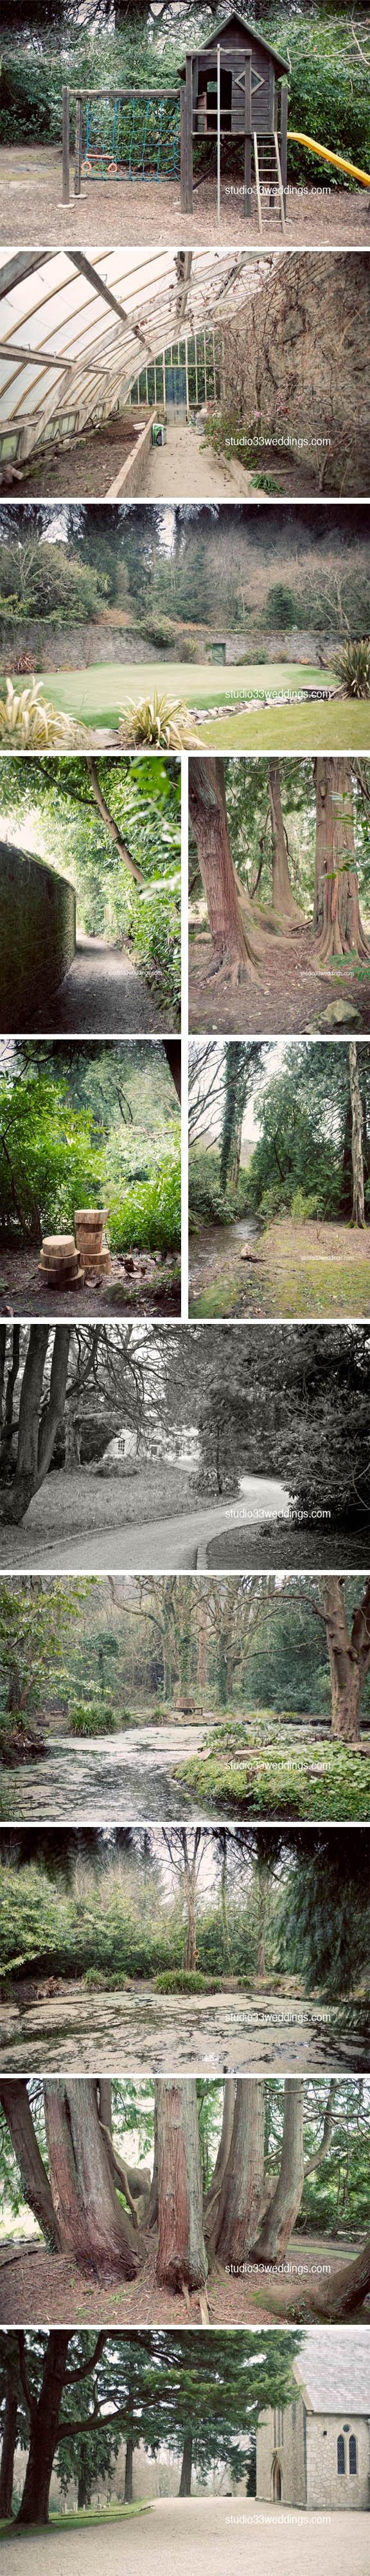 #Trudder Lodge locations by studio33weddings.com